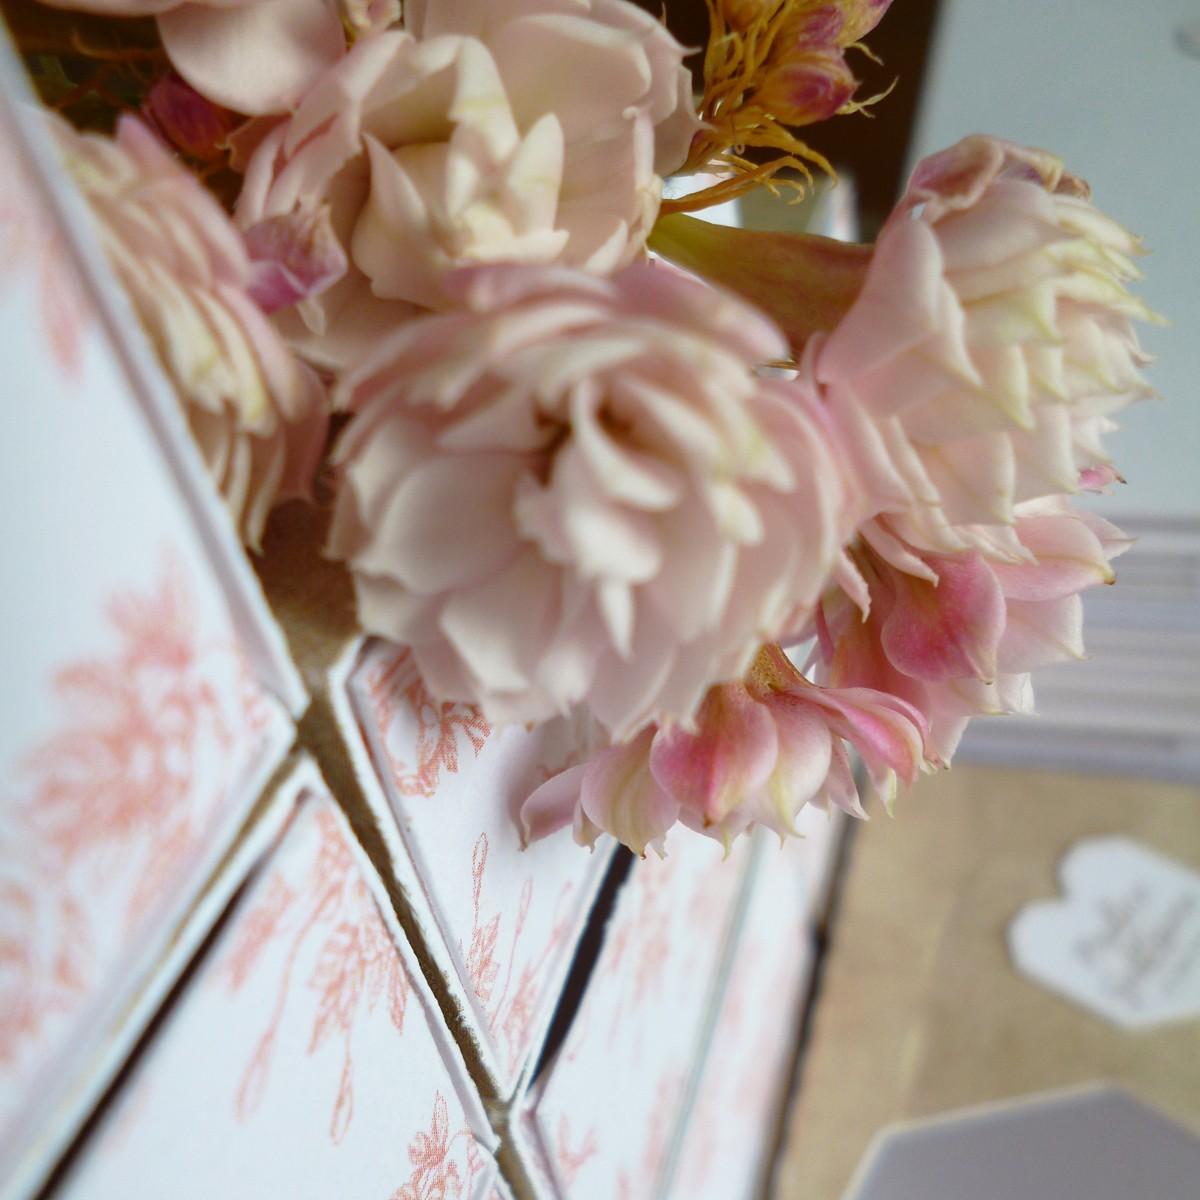 pauline guillaume mariage au domaine du ch teau de verderonne origami pliage helene. Black Bedroom Furniture Sets. Home Design Ideas